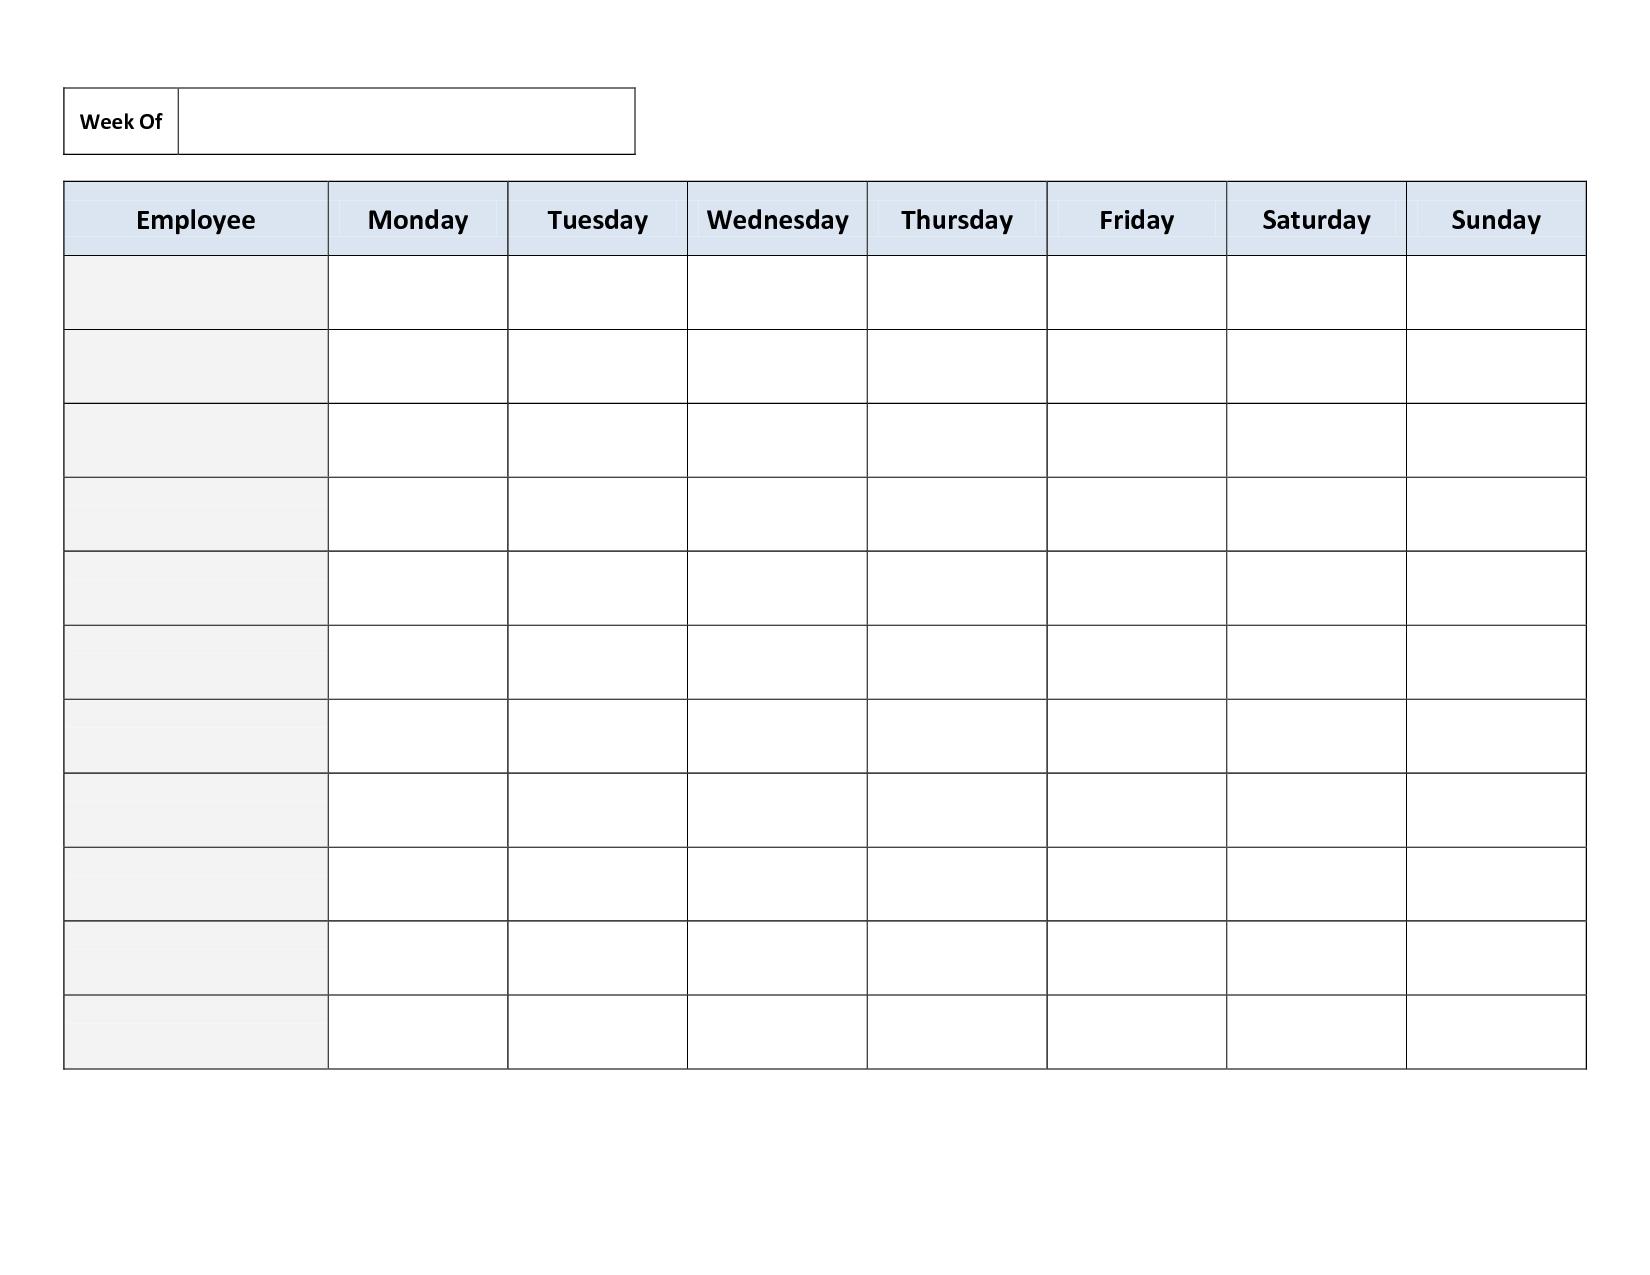 Weekly Employee Work Schedule Template. Free Blank Schedule.pdf - Free Printable Documents